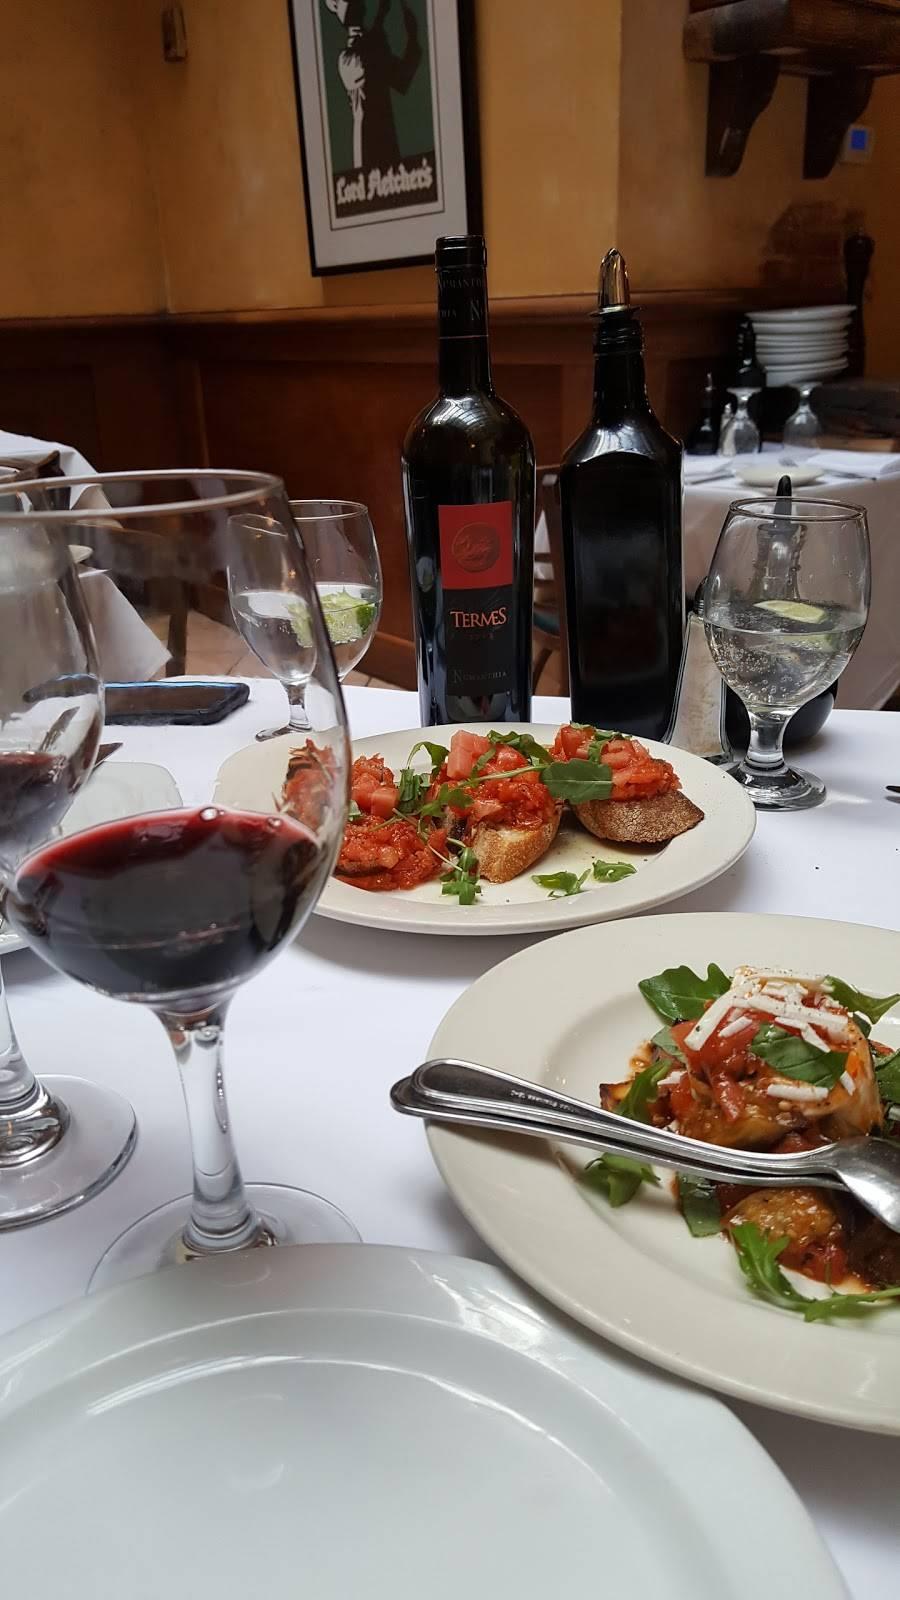 Gigino Trattoria | restaurant | 323 Greenwich St, New York, NY 10013, USA | 2124311112 OR +1 212-431-1112